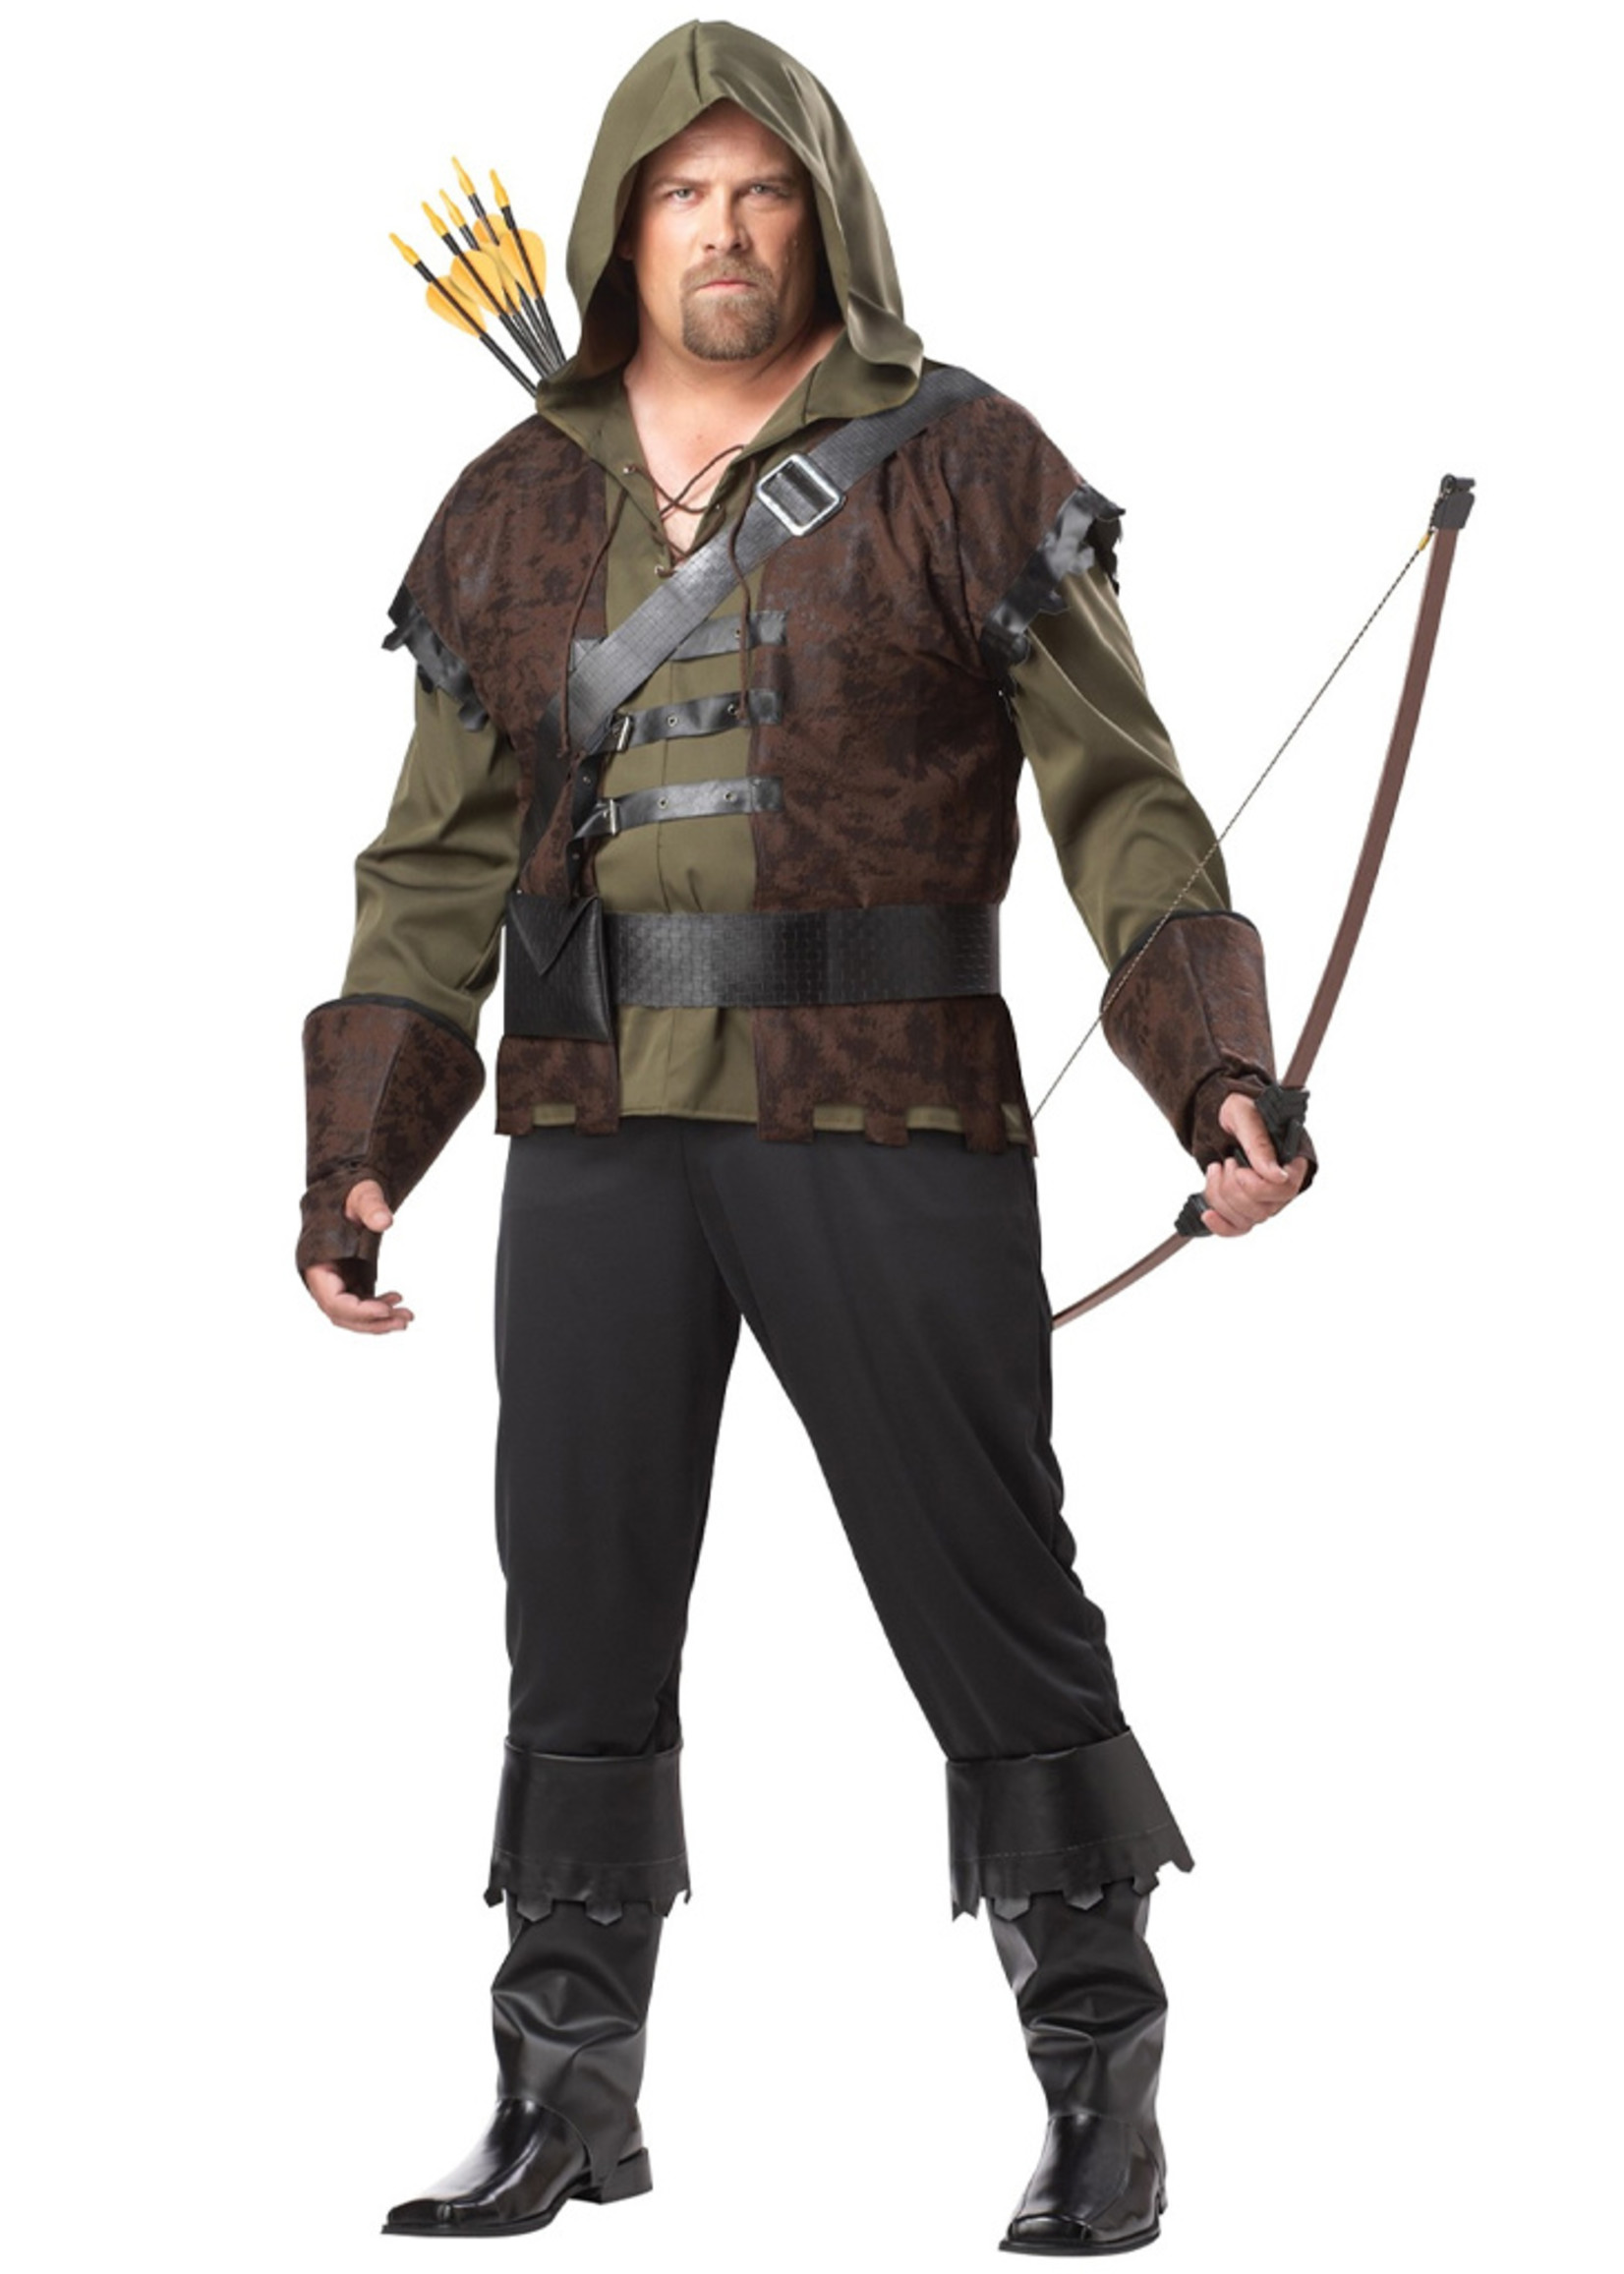 Robin Hood Costume - Men's Plus